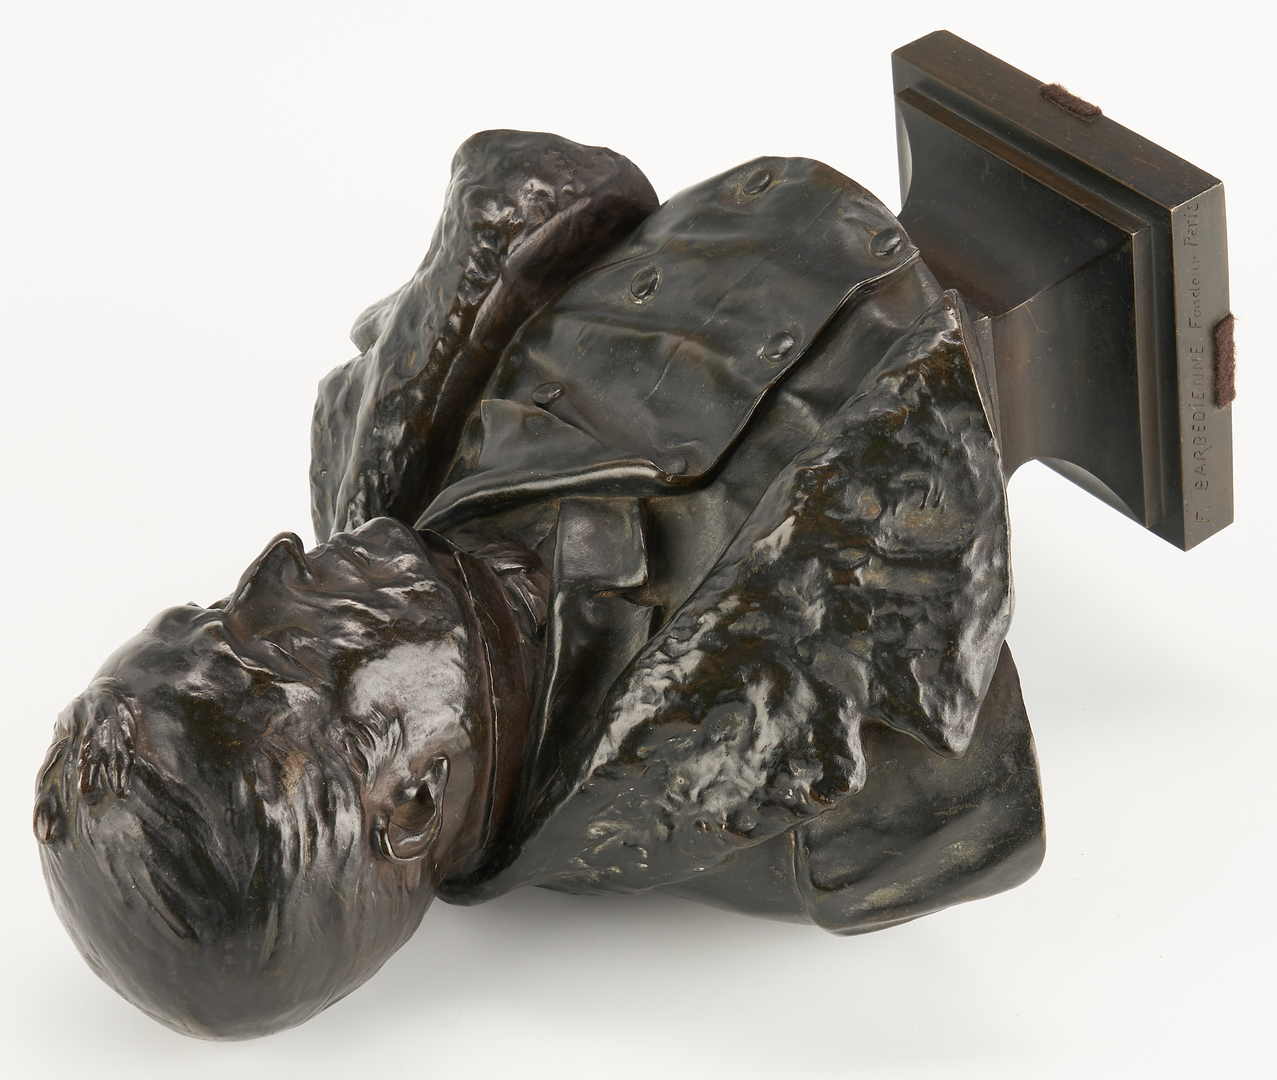 Lot 246: Ernest Guilbert Bronze Sculpture, Barbedienne Foundry